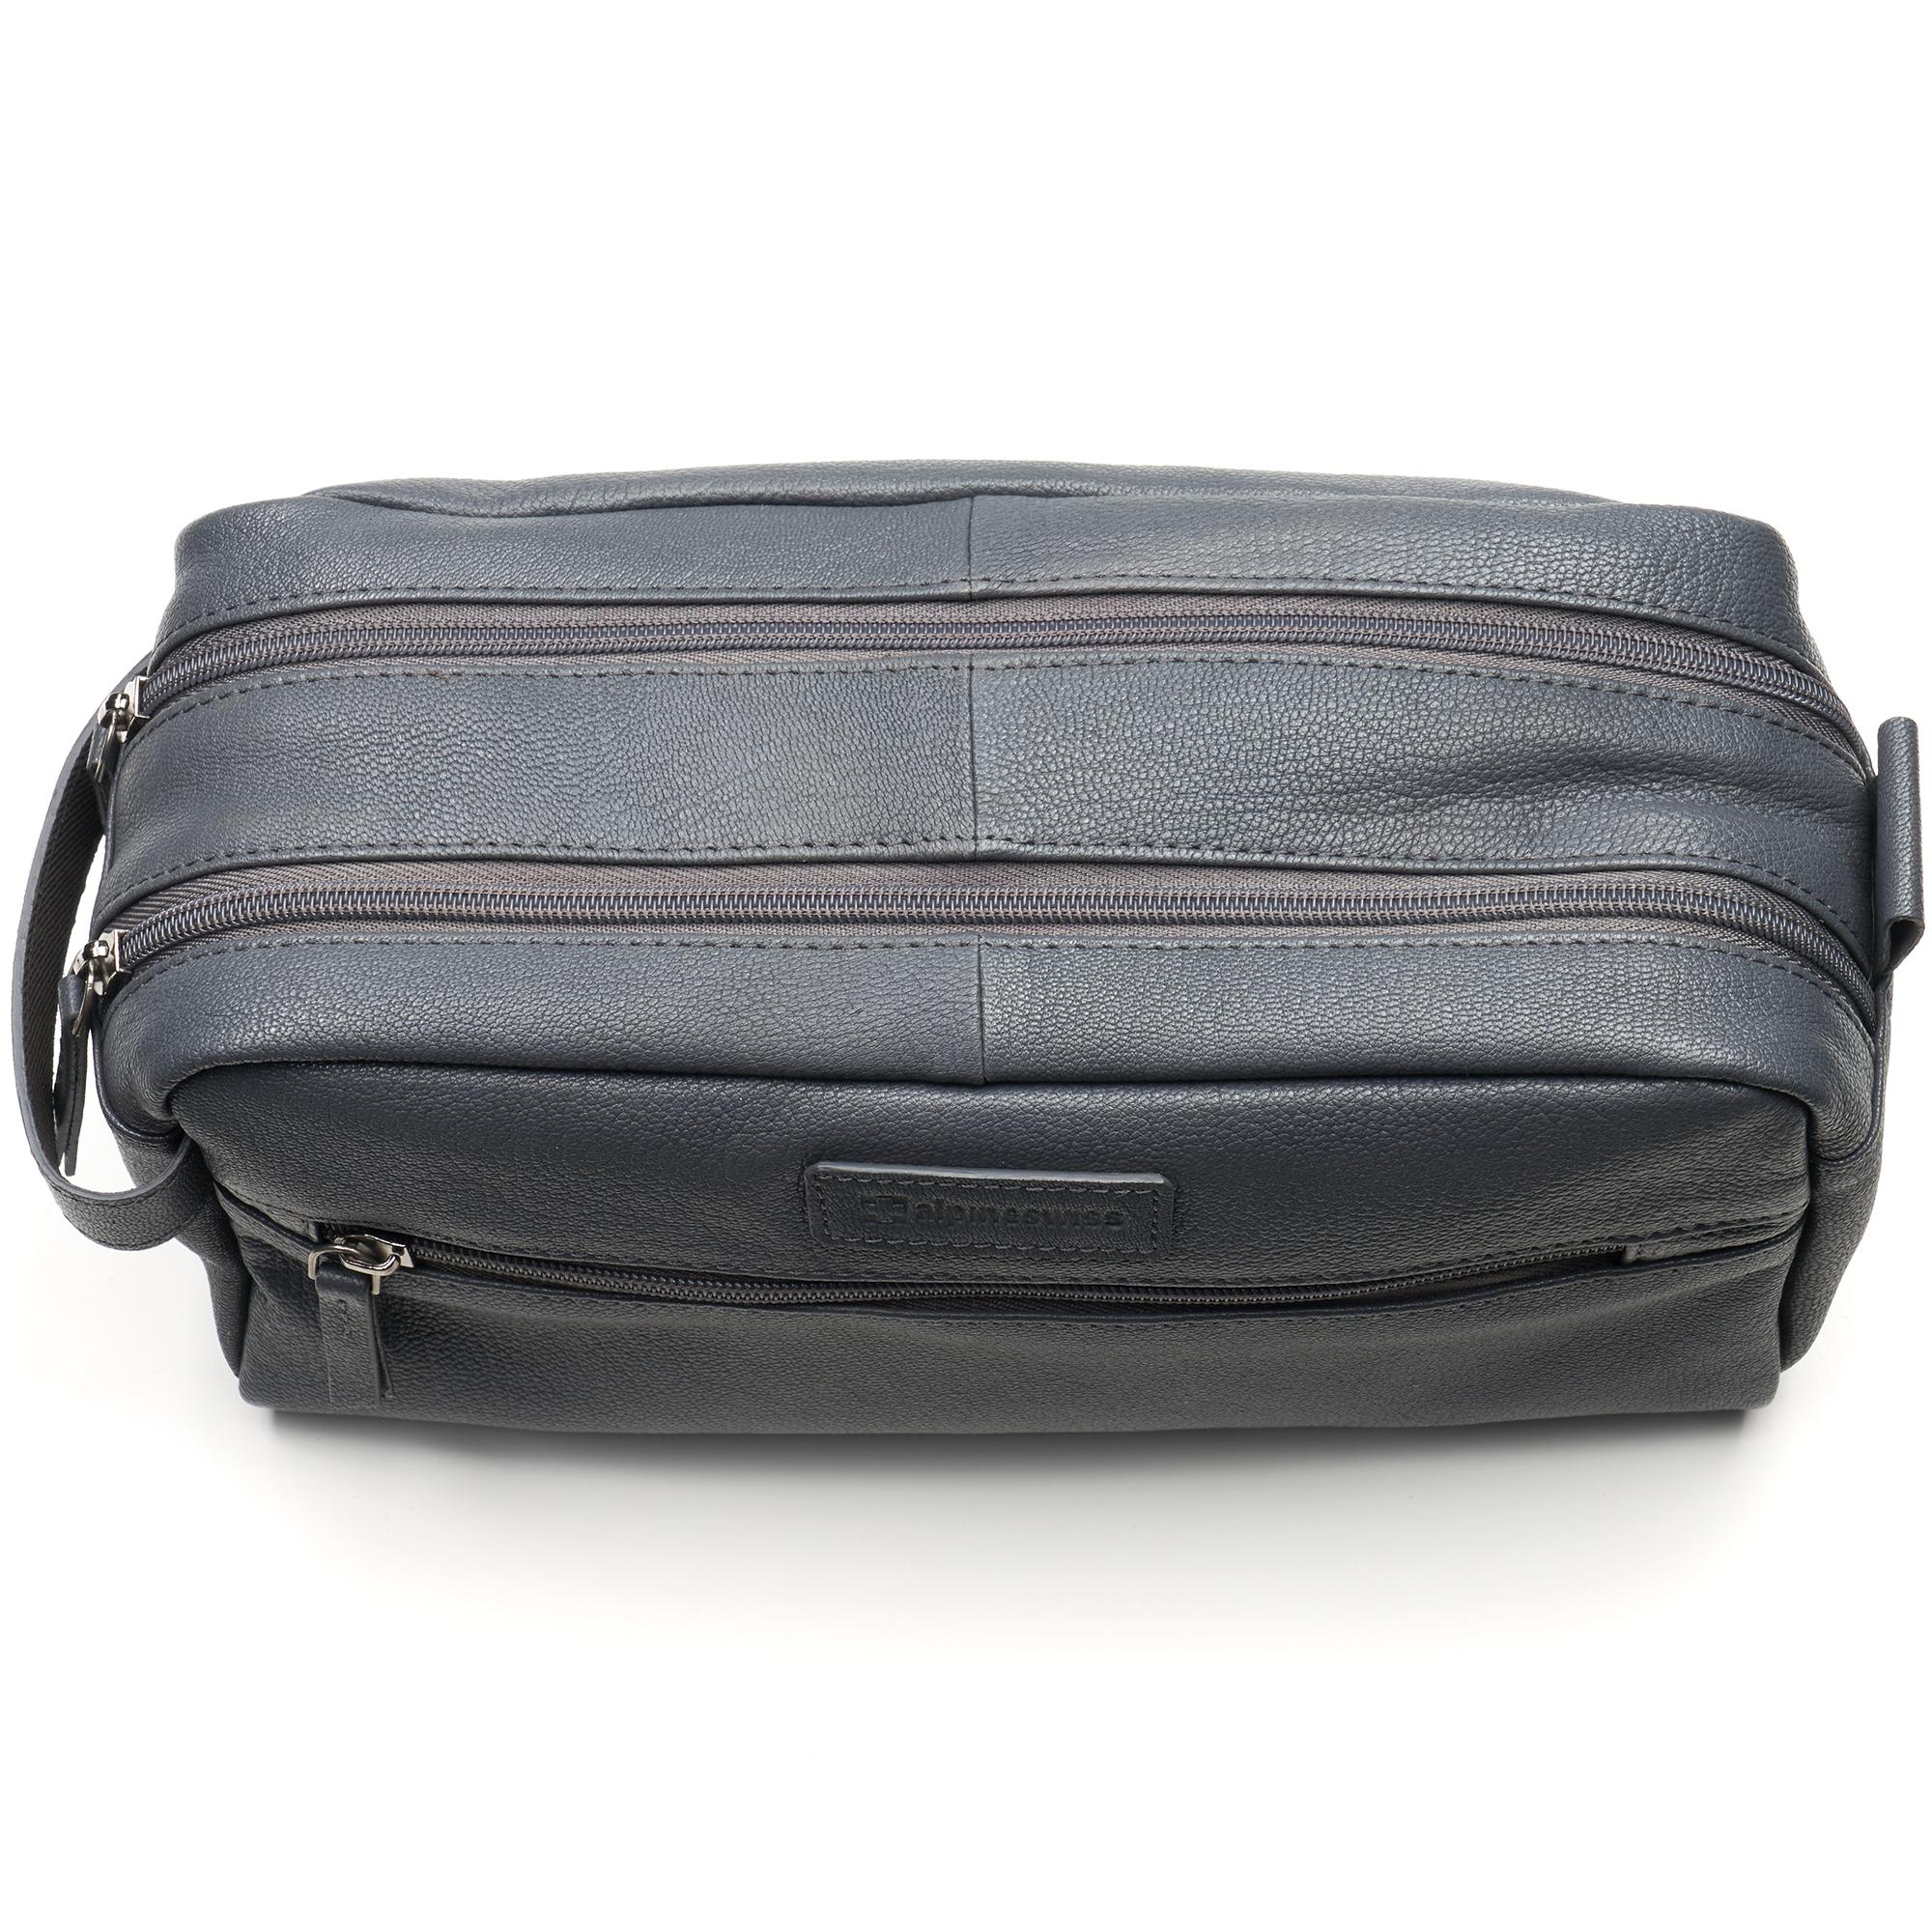 AlpineSwiss-Sedona-Toiletry-Bag-Genuine-Leather-Shaving-Kit-Dopp-Kit-Travel-Case thumbnail 27